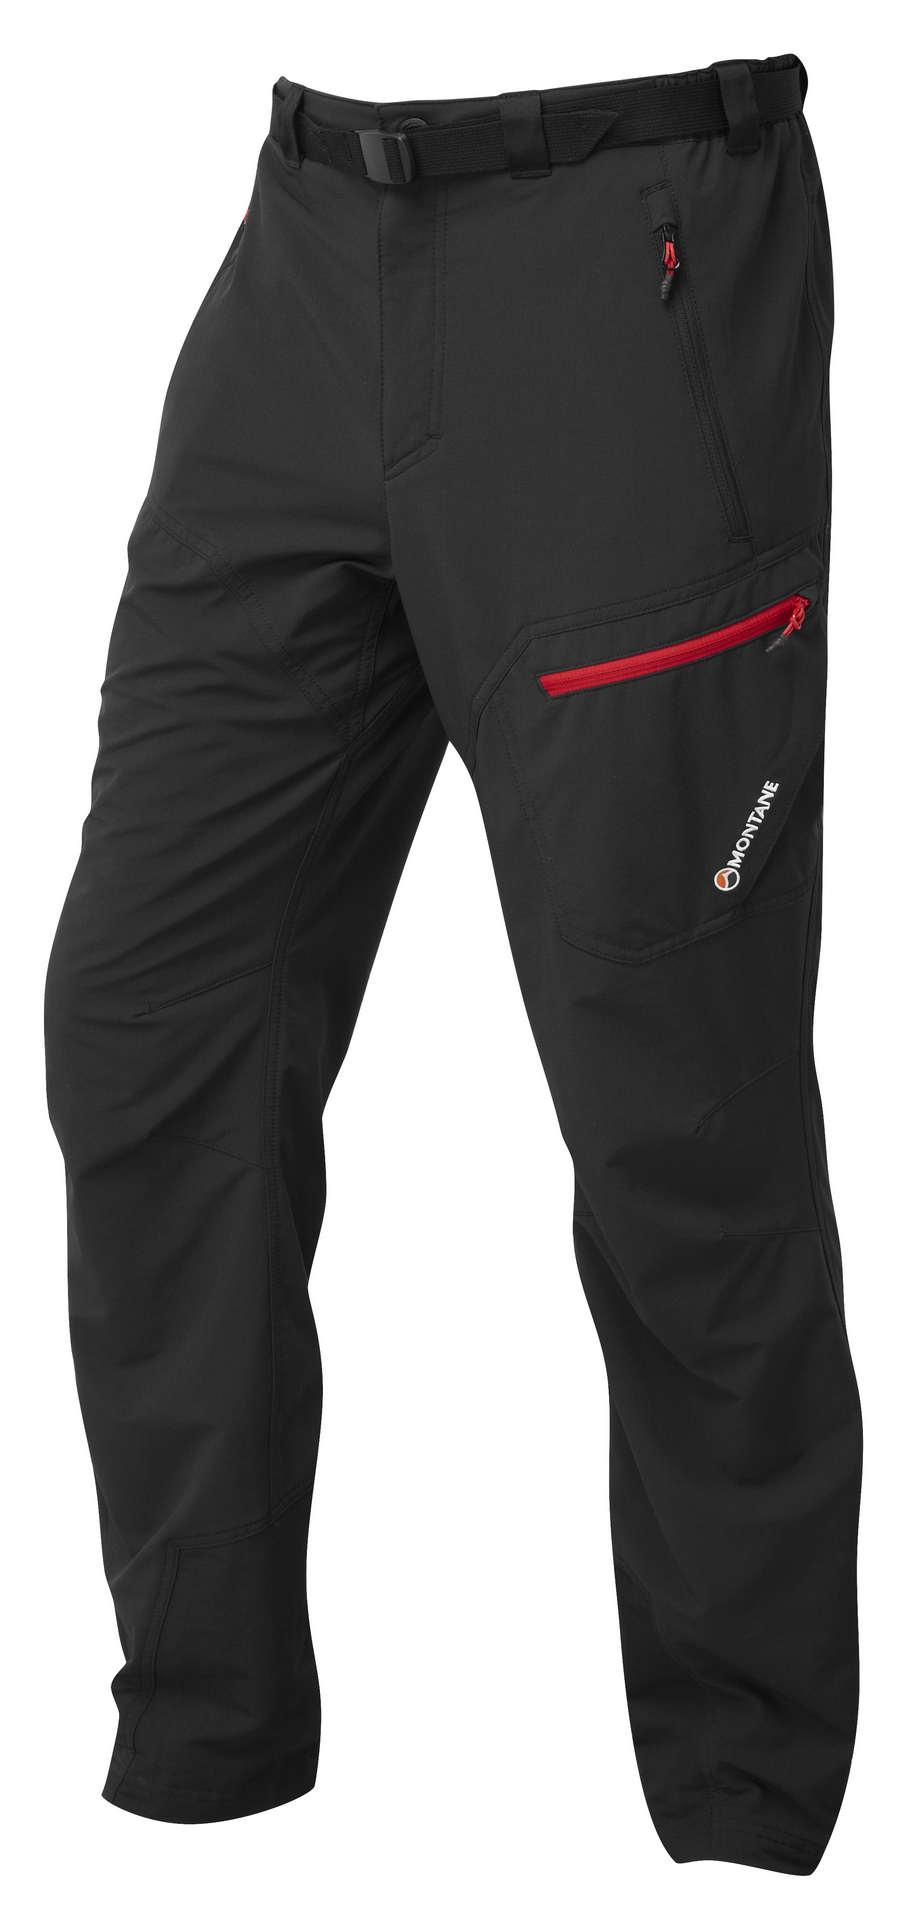 Montane Alpine Trek softshell pants